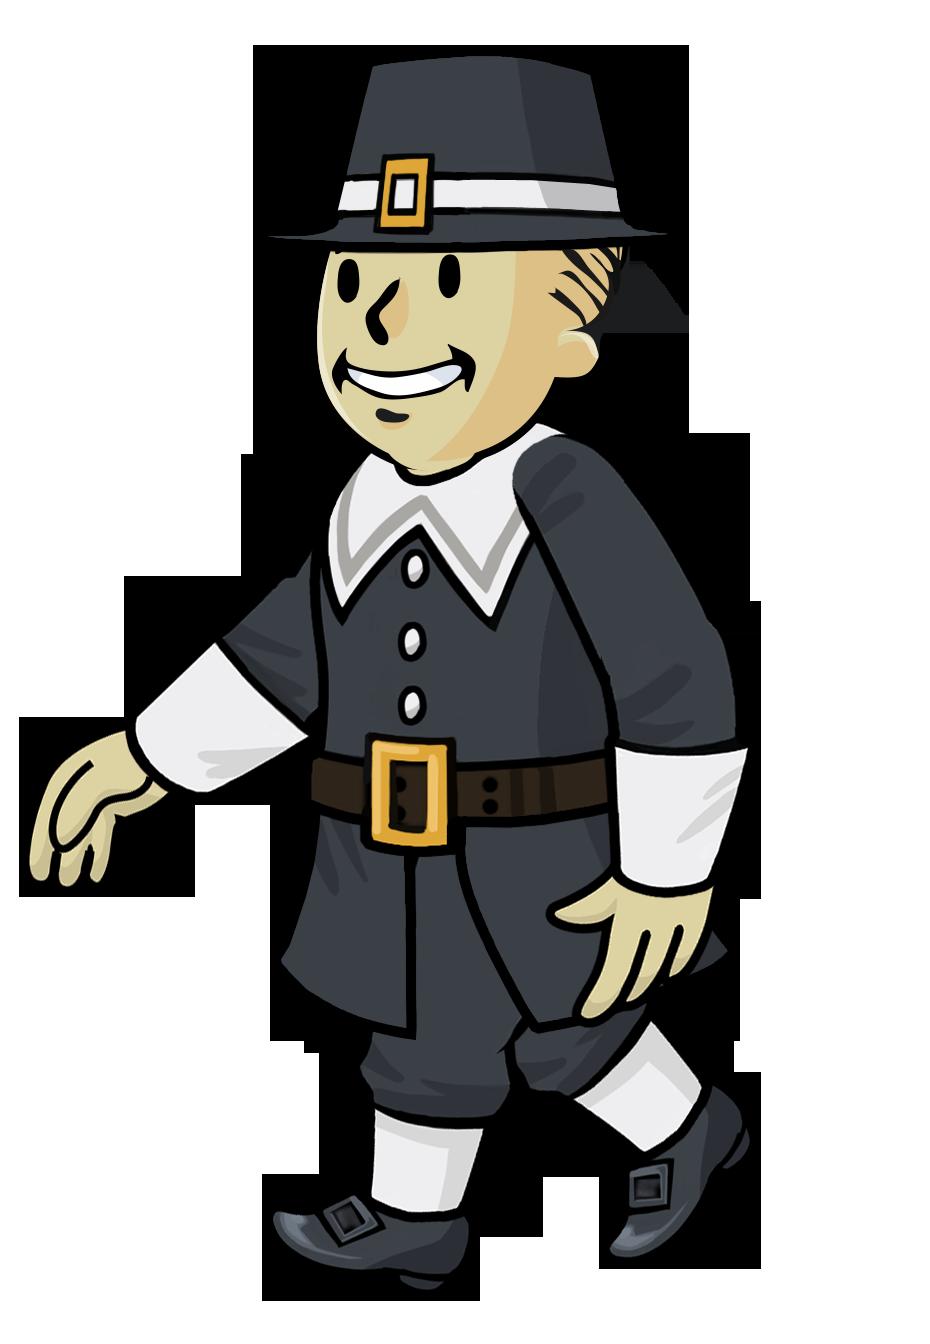 Pilgrims clipart outfit. Image fos pilgrim male